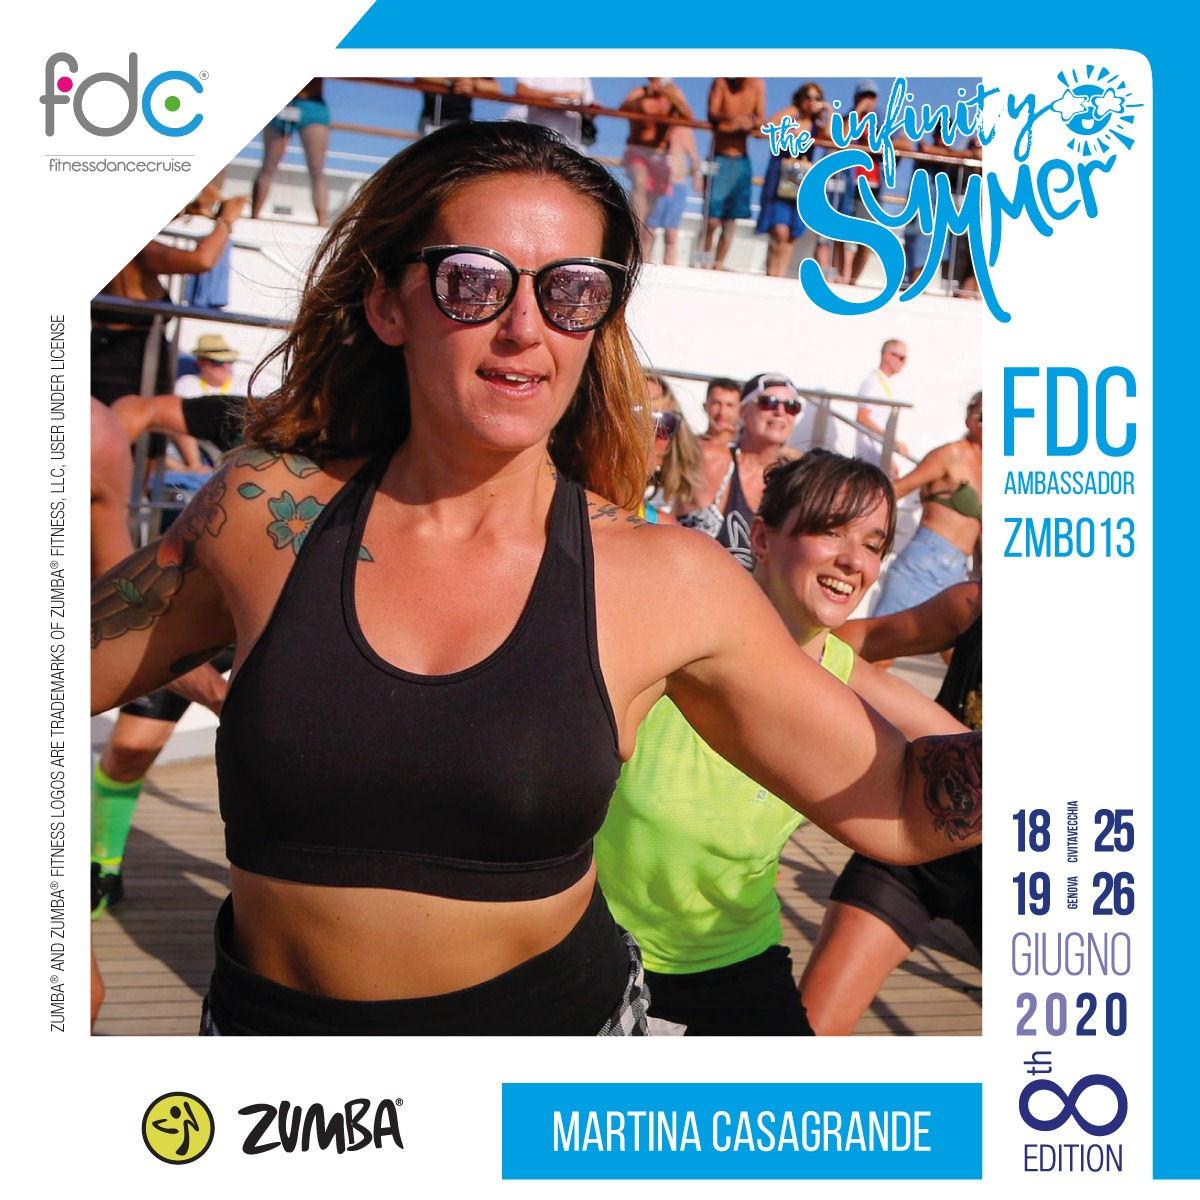 FDC Team Martina Casagrande